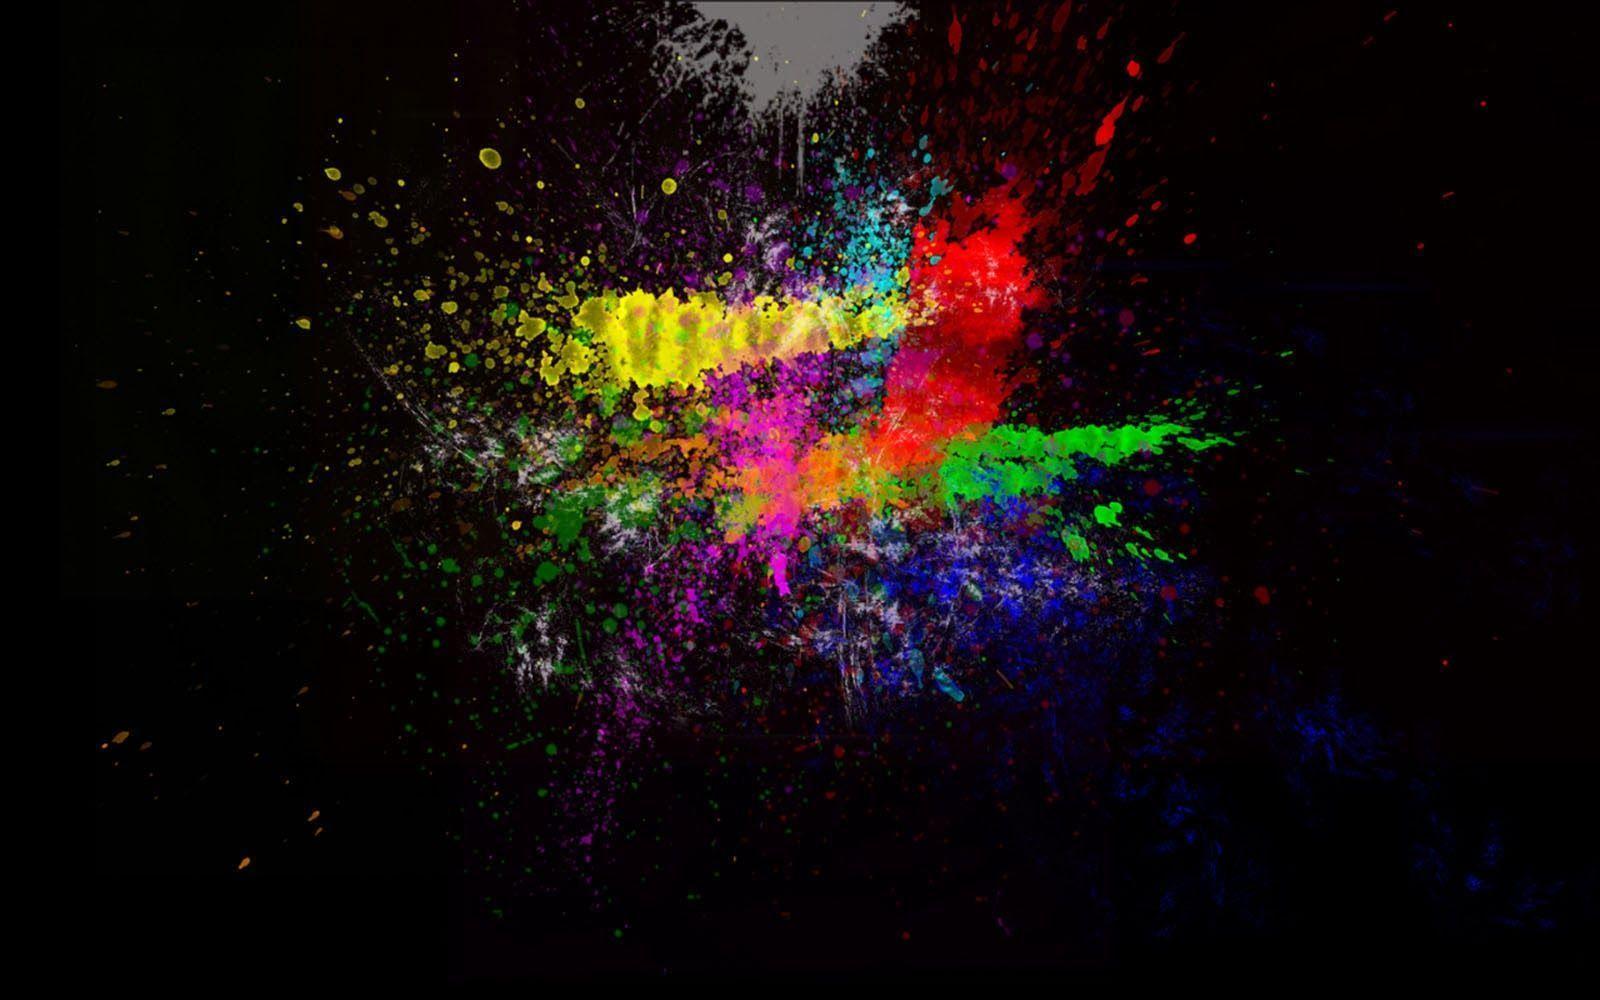 hd wallpapers splash art - photo #35